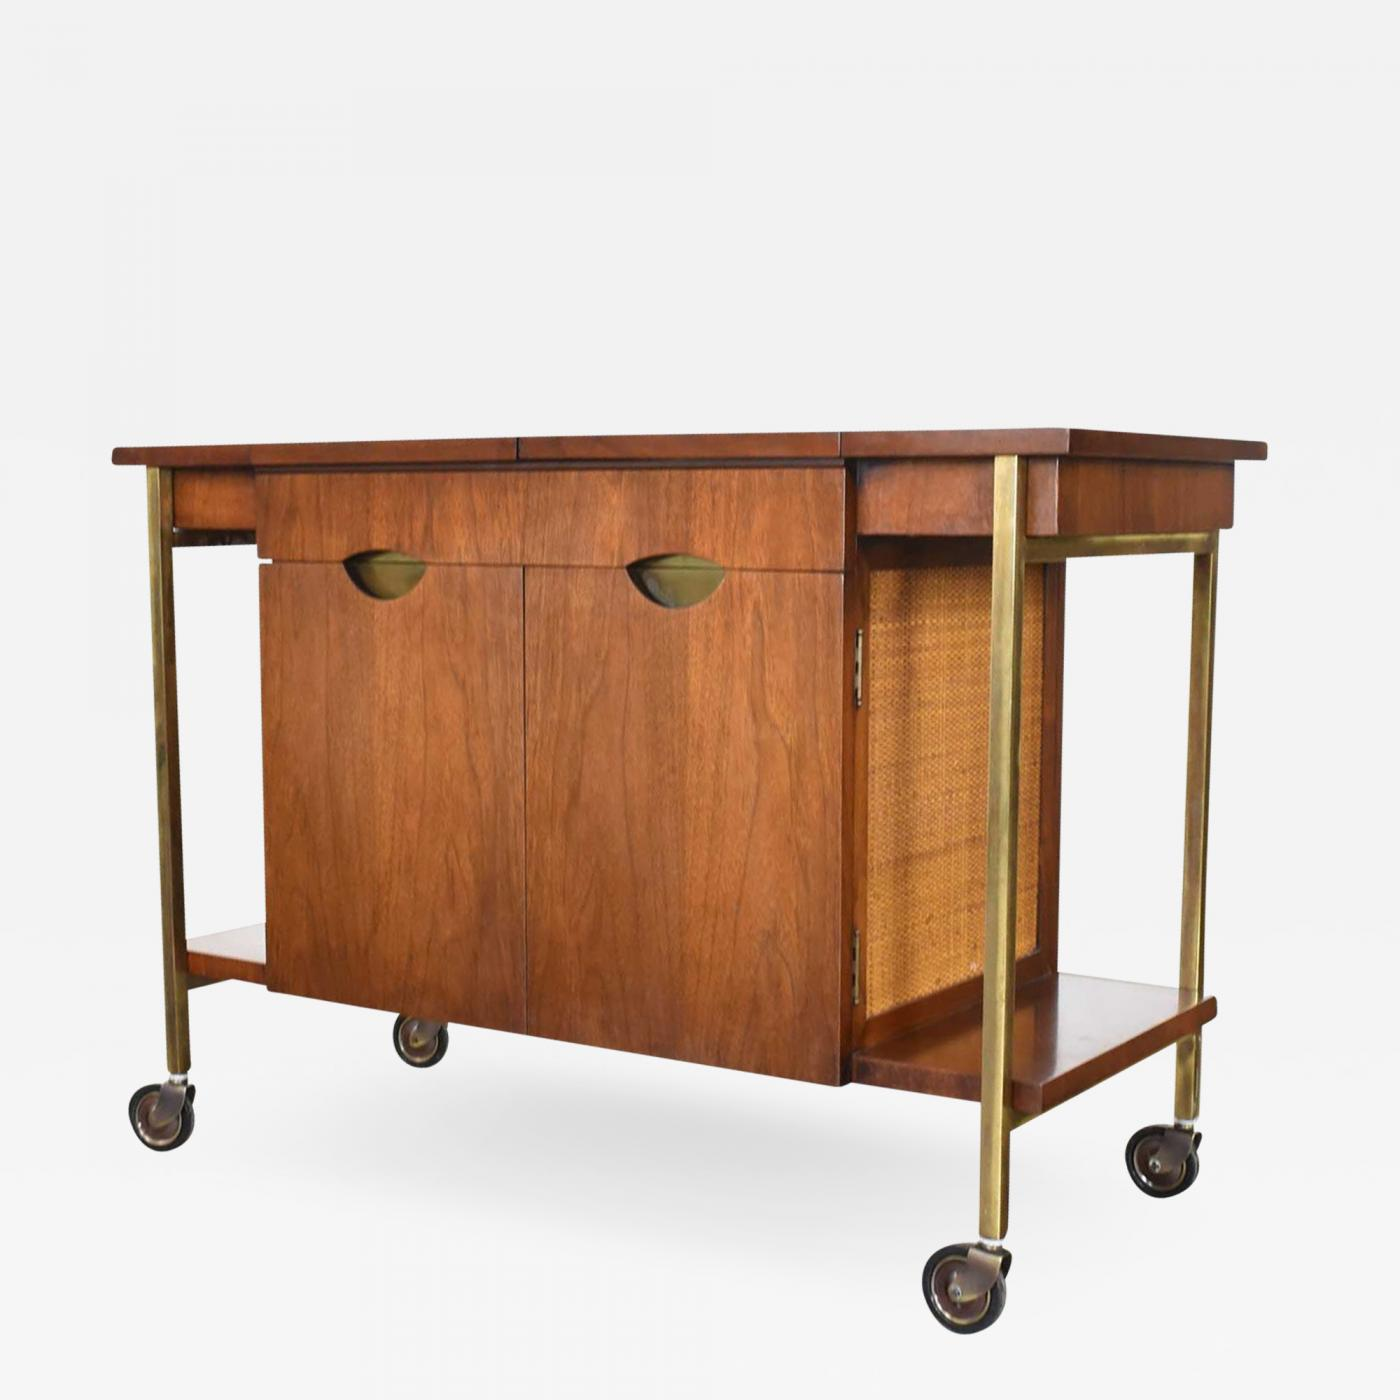 Heritage Furniture Heritage Vintage Mid Century Modern Walnut Cane Rolling Bar Cart Cocktail Cart